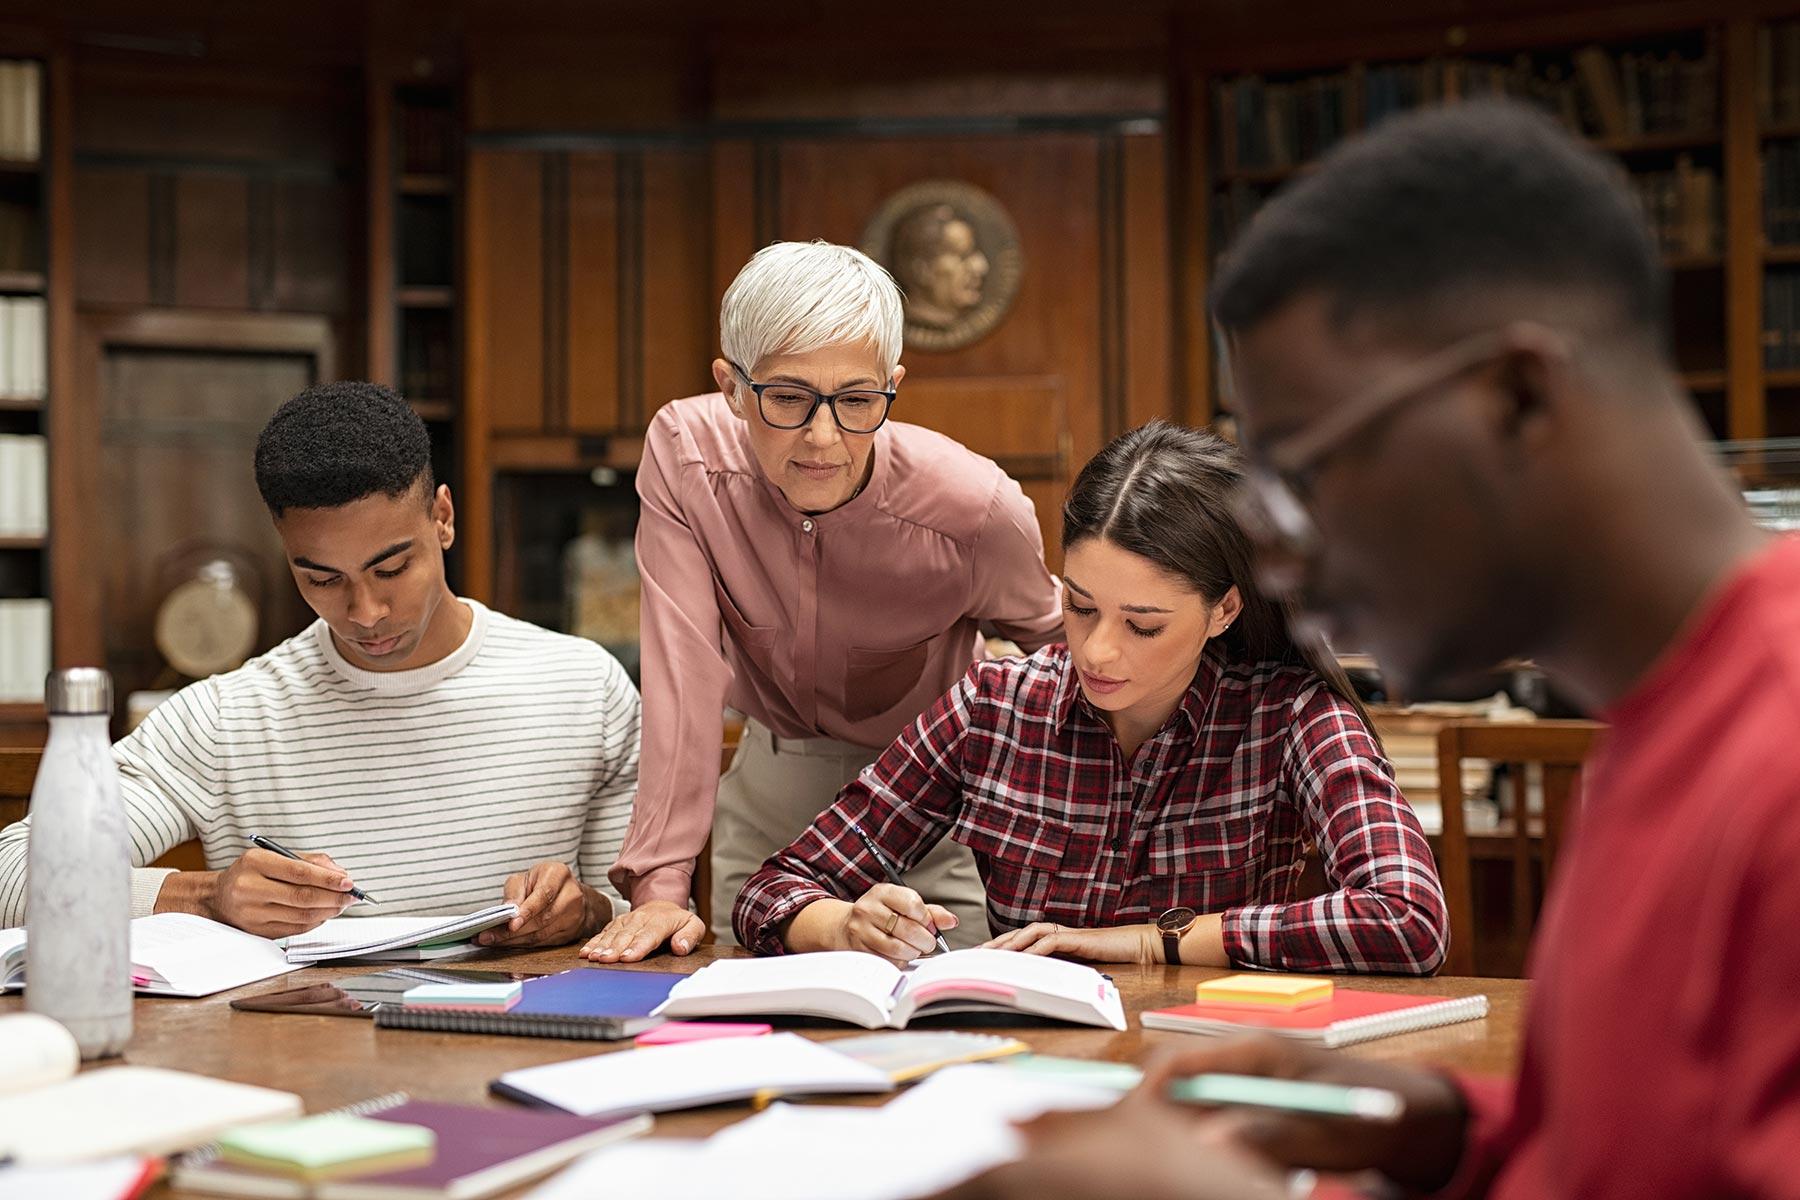 university-students-studying-with-teacher-DVBPU45.jpg